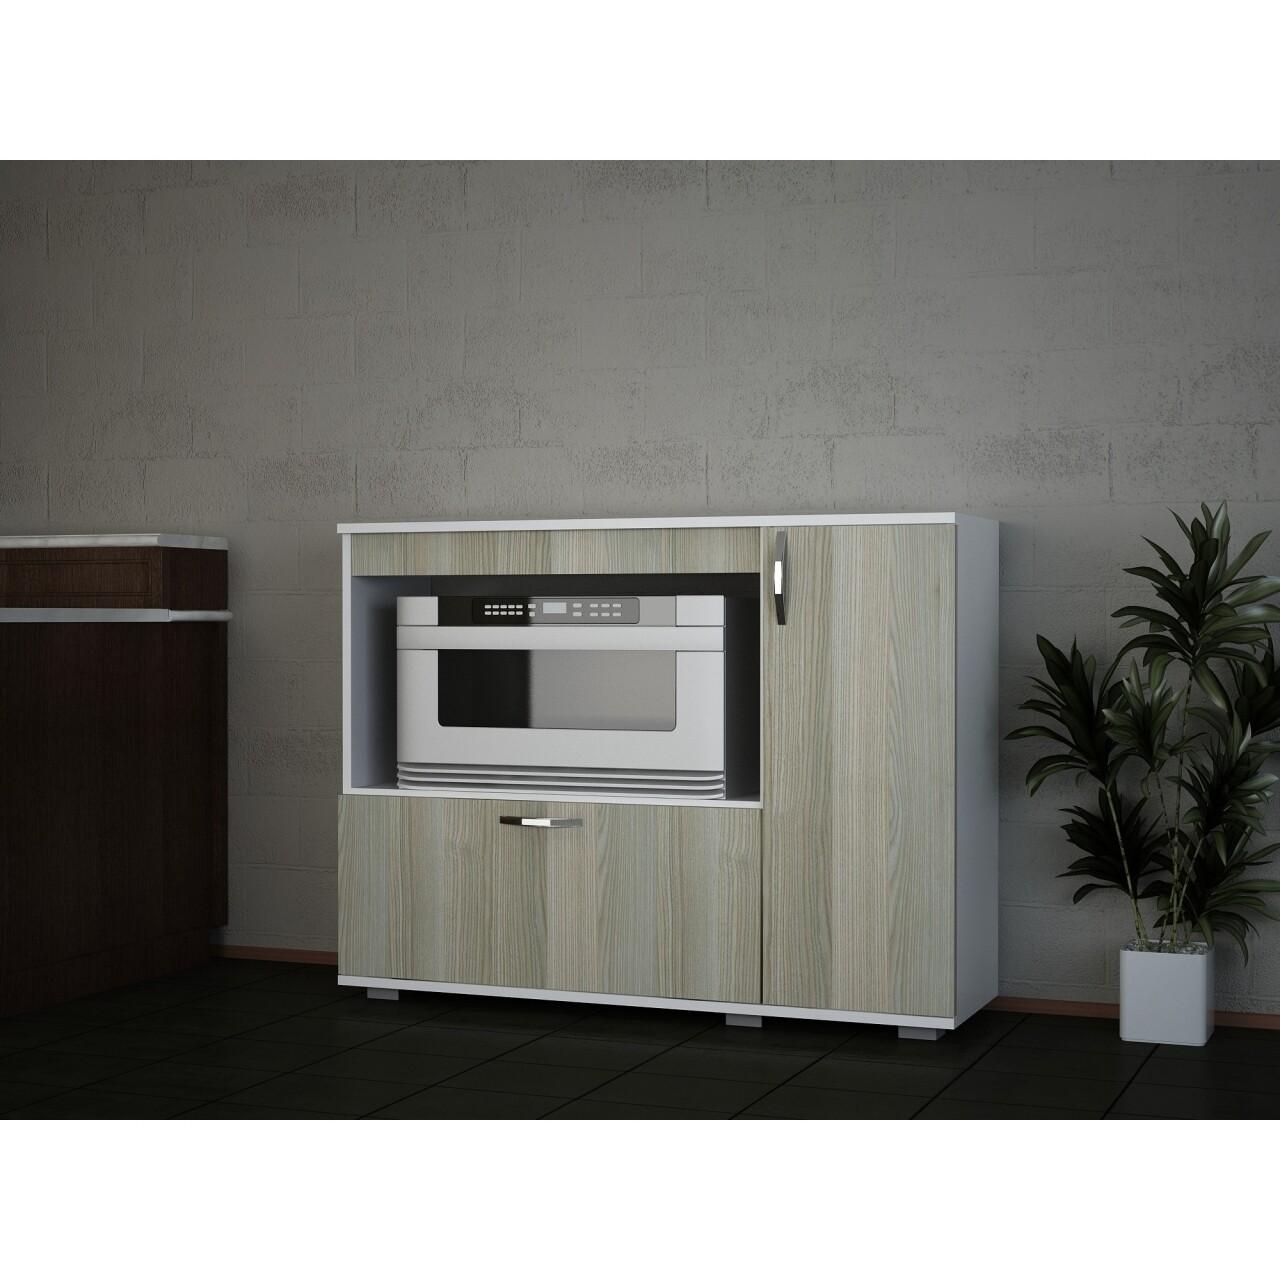 Dulap pentru bucatarie, Wooden Art, Charlotta White Cordoba, 118.2x90x35 cm